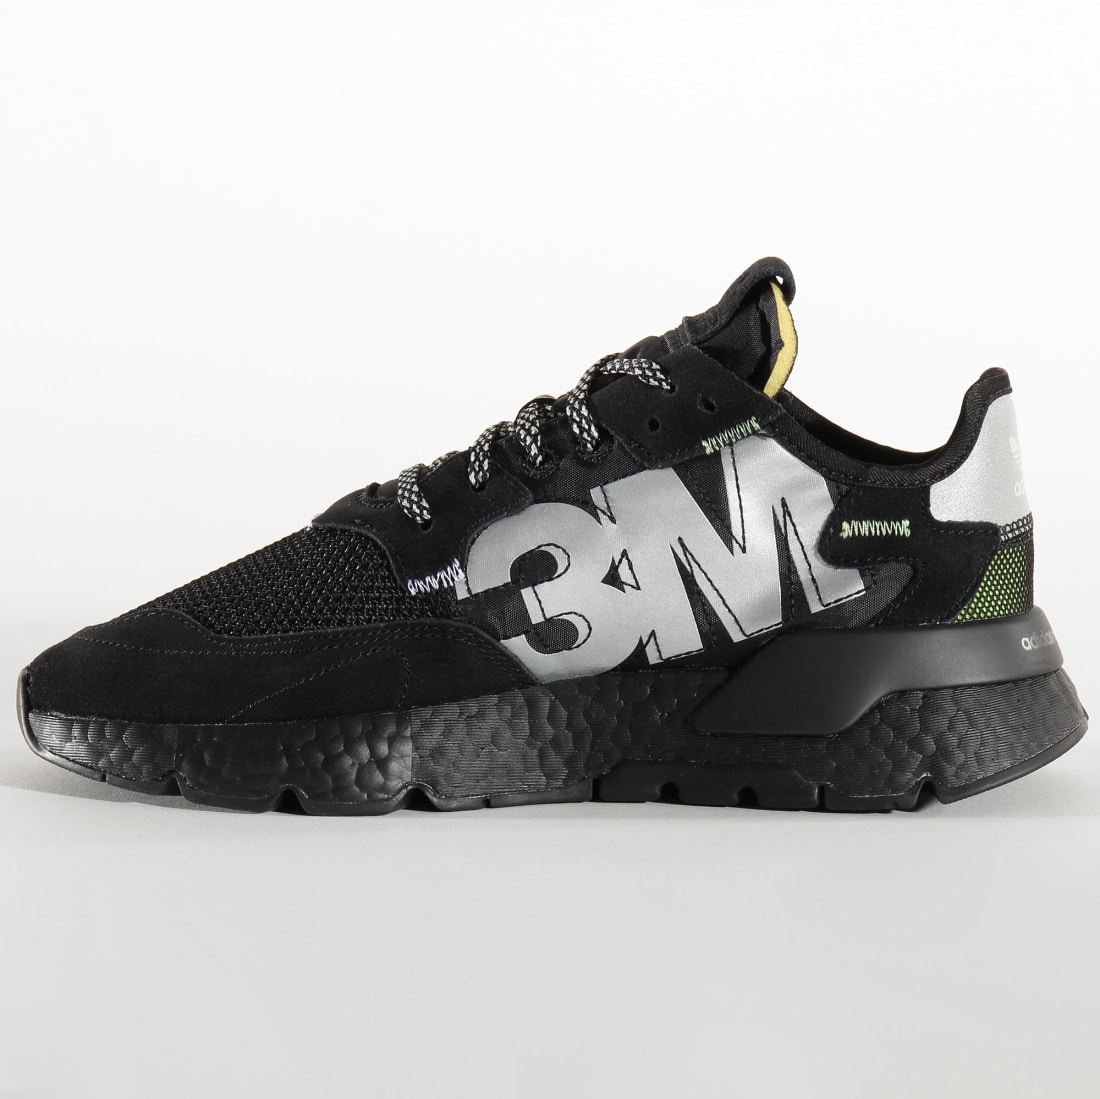 adidas Baskets Nite Jogger EE5884 Core Black Core Black